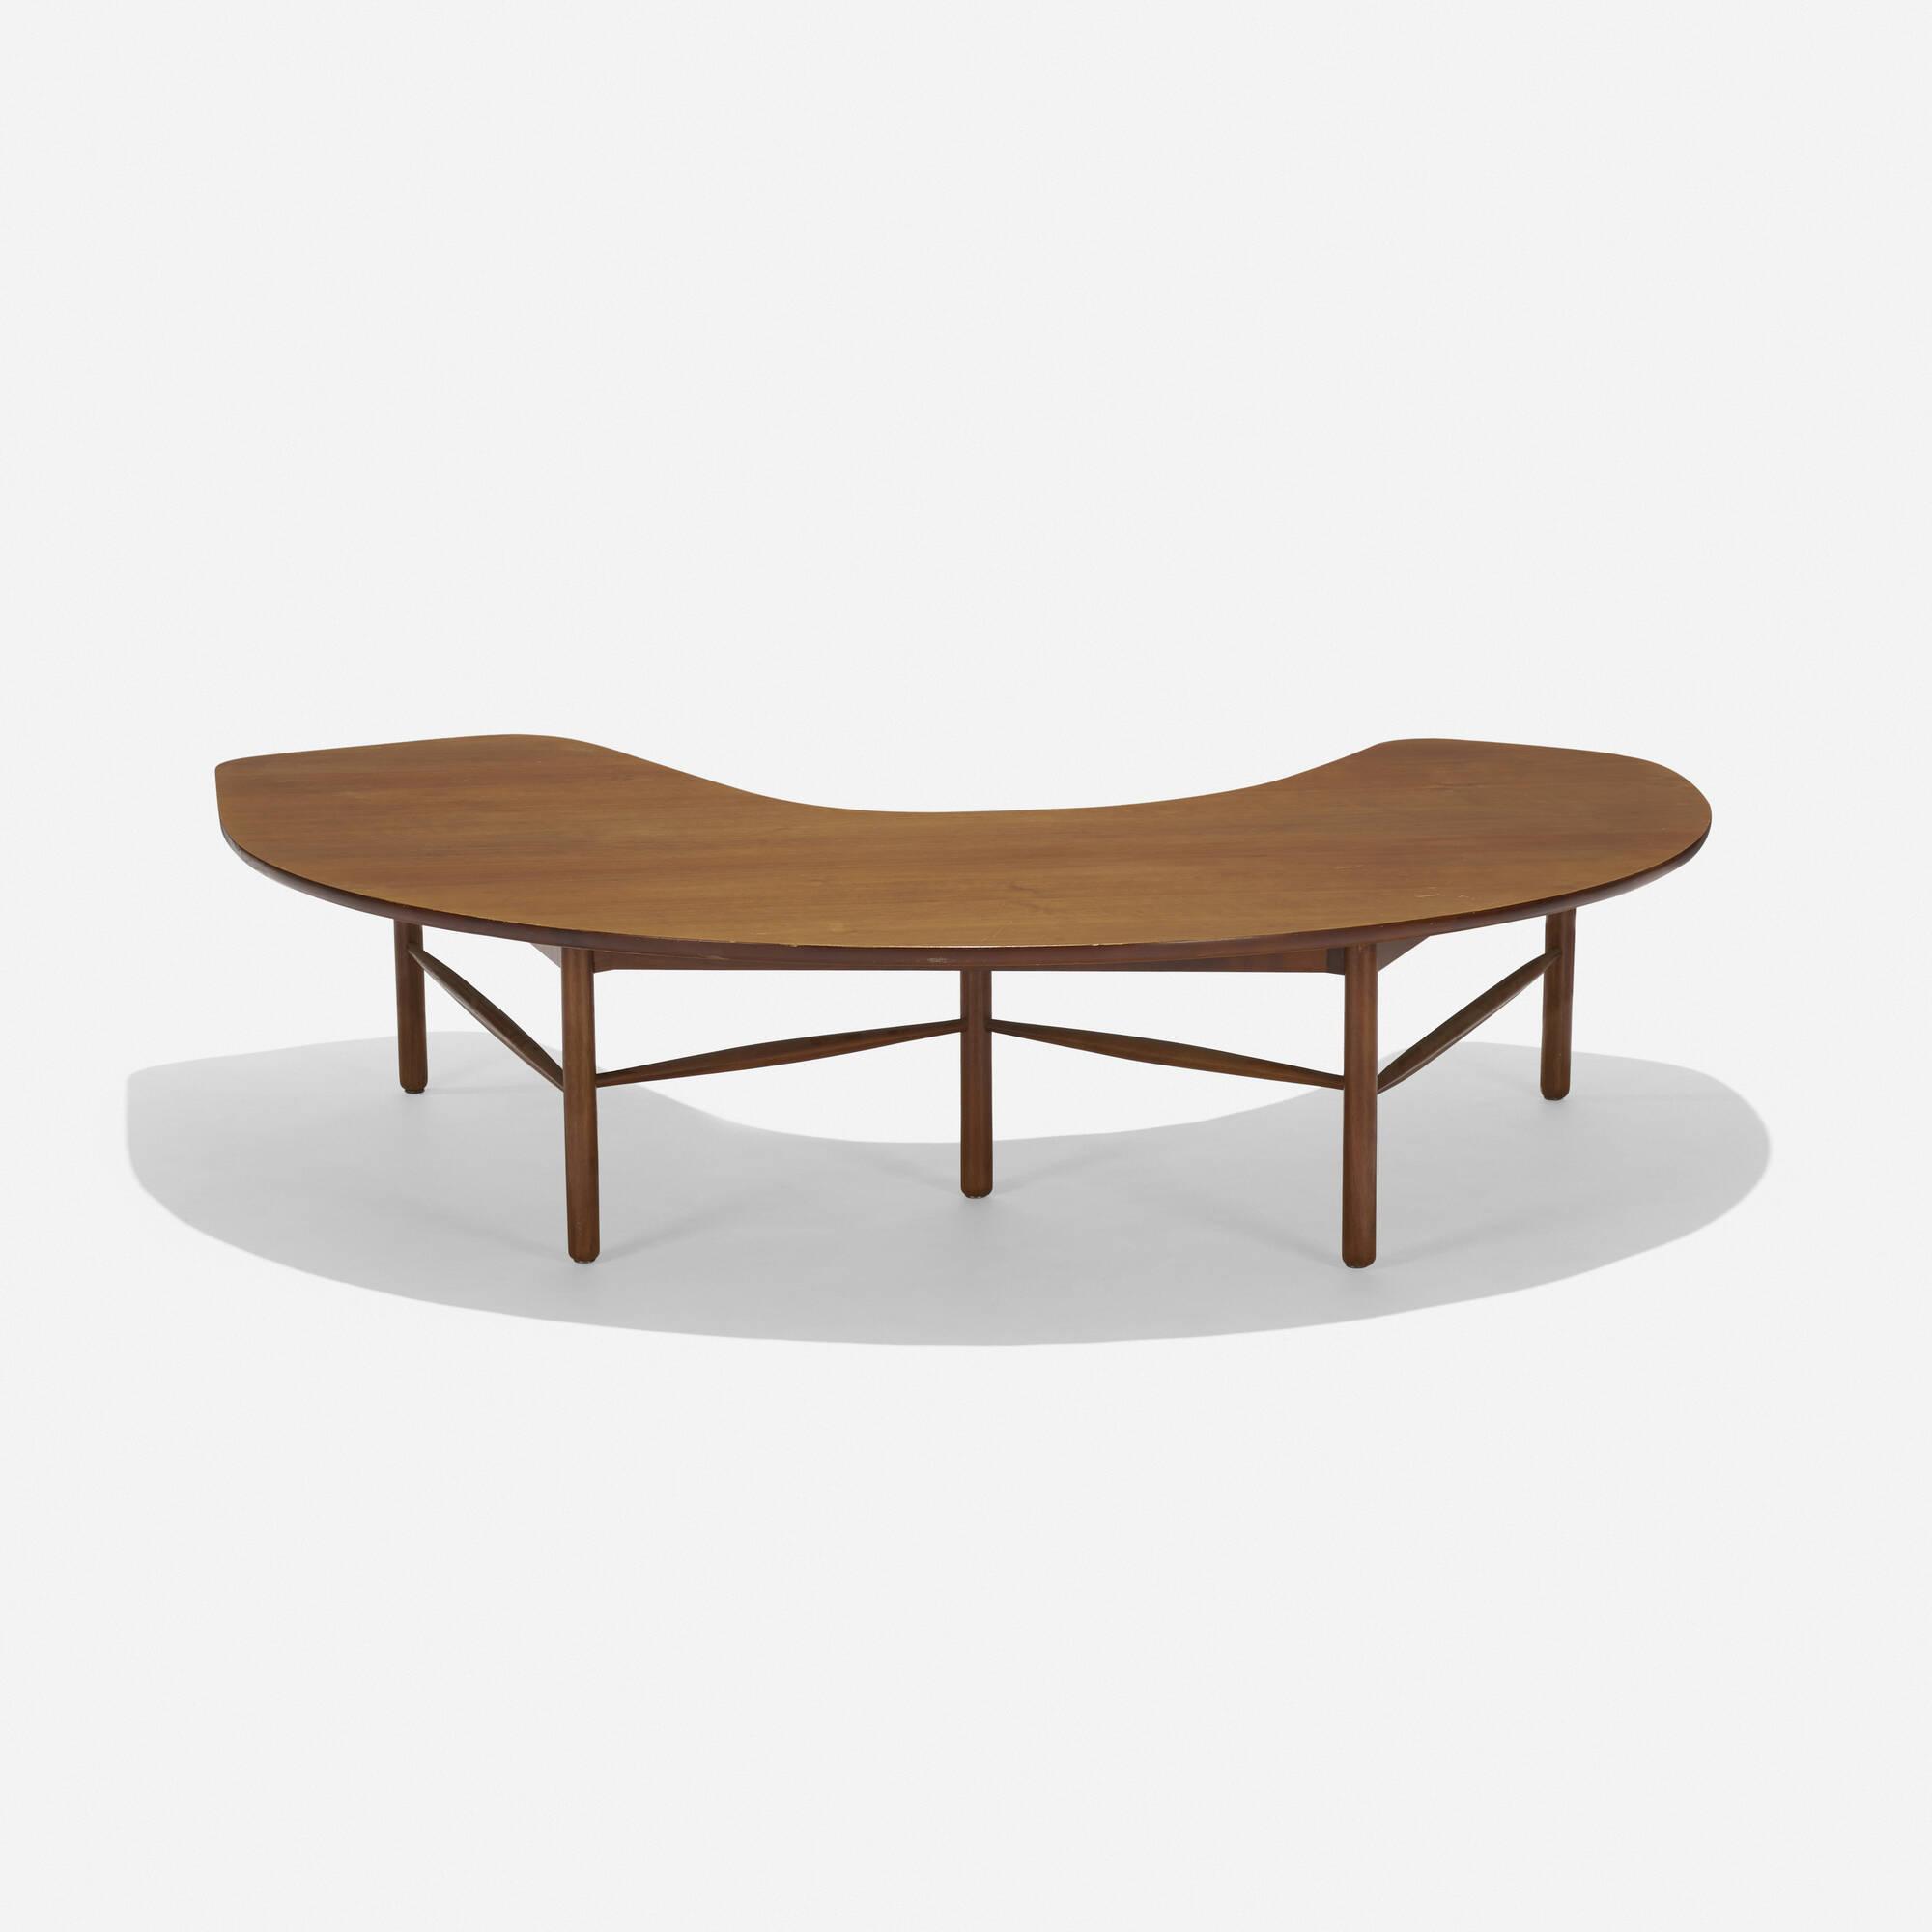 280 greta magnusson grossman rare coffee table american design 280 greta magnusson grossman rare coffee table 2 of 3 geotapseo Gallery